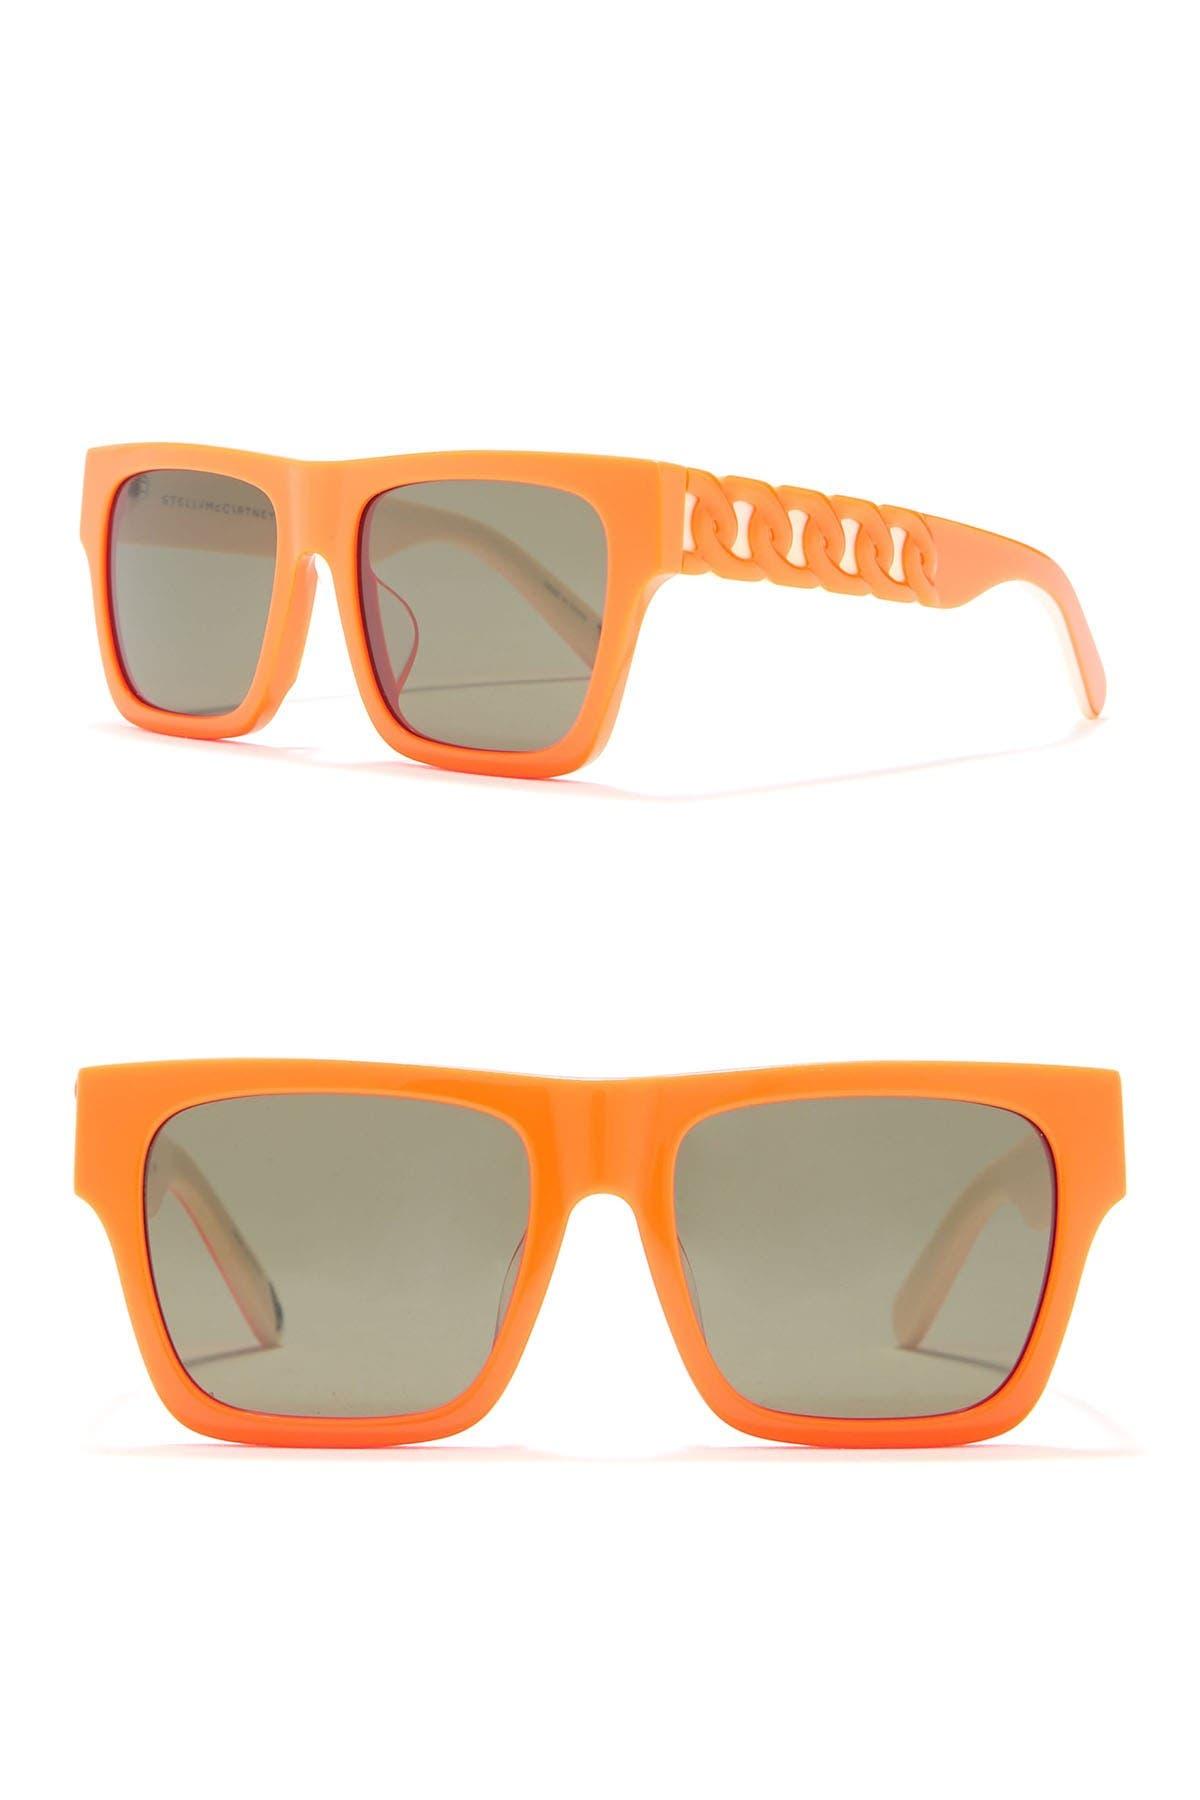 Image of Stella McCartney 47mm Irregular Sunglasses